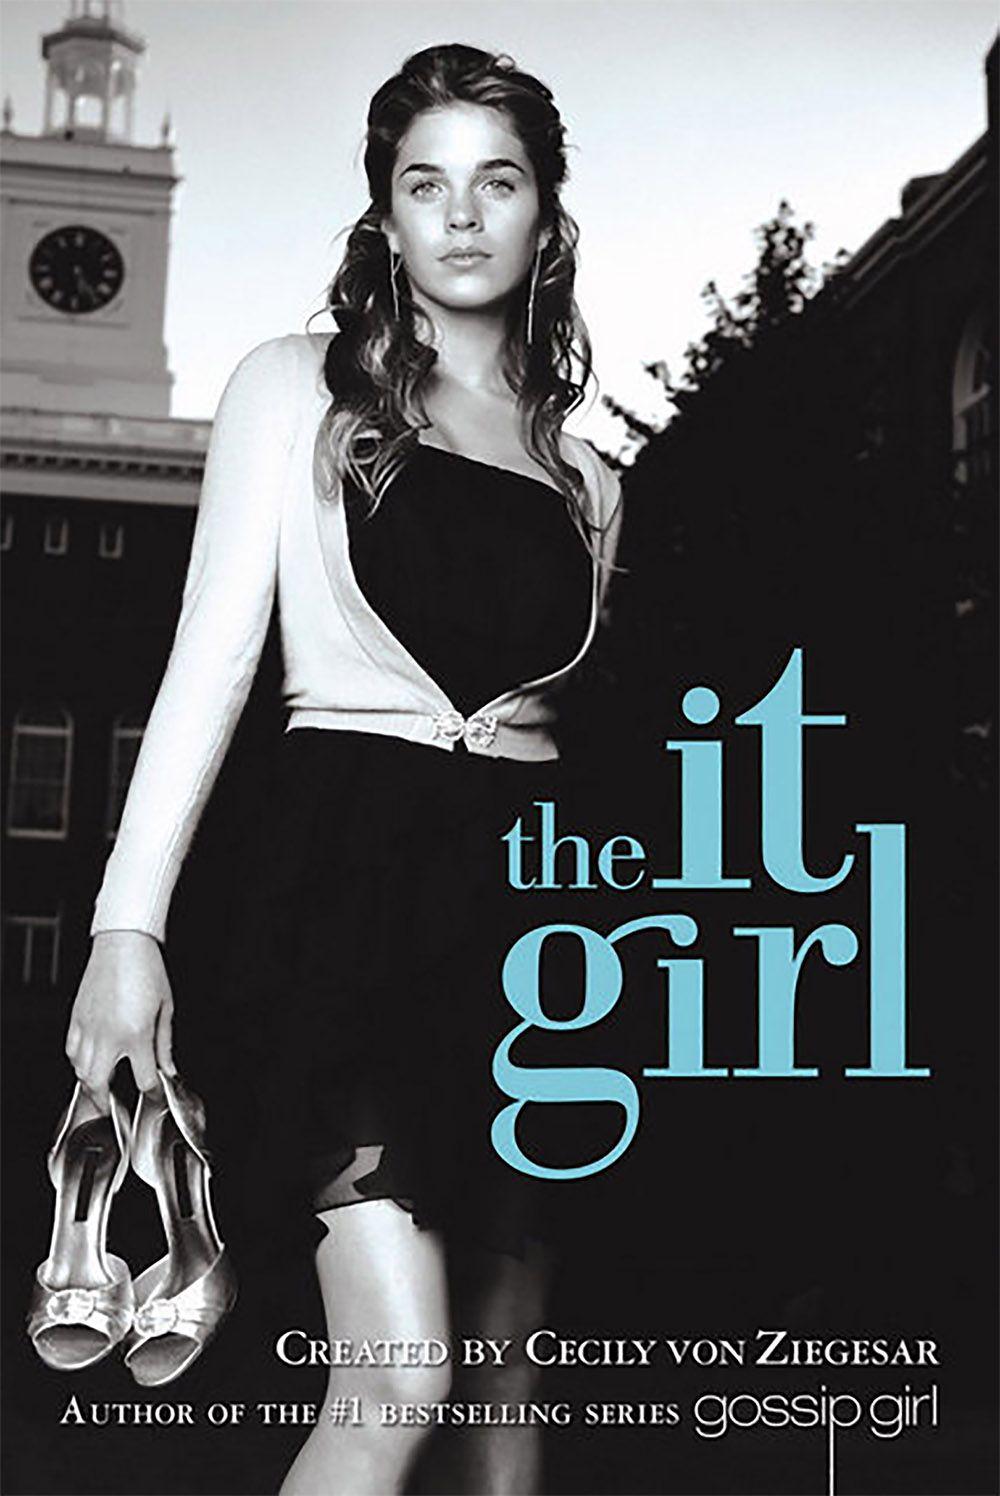 the-it-girl-cover-1-3ea77e85206764541023955738e22518.jpg